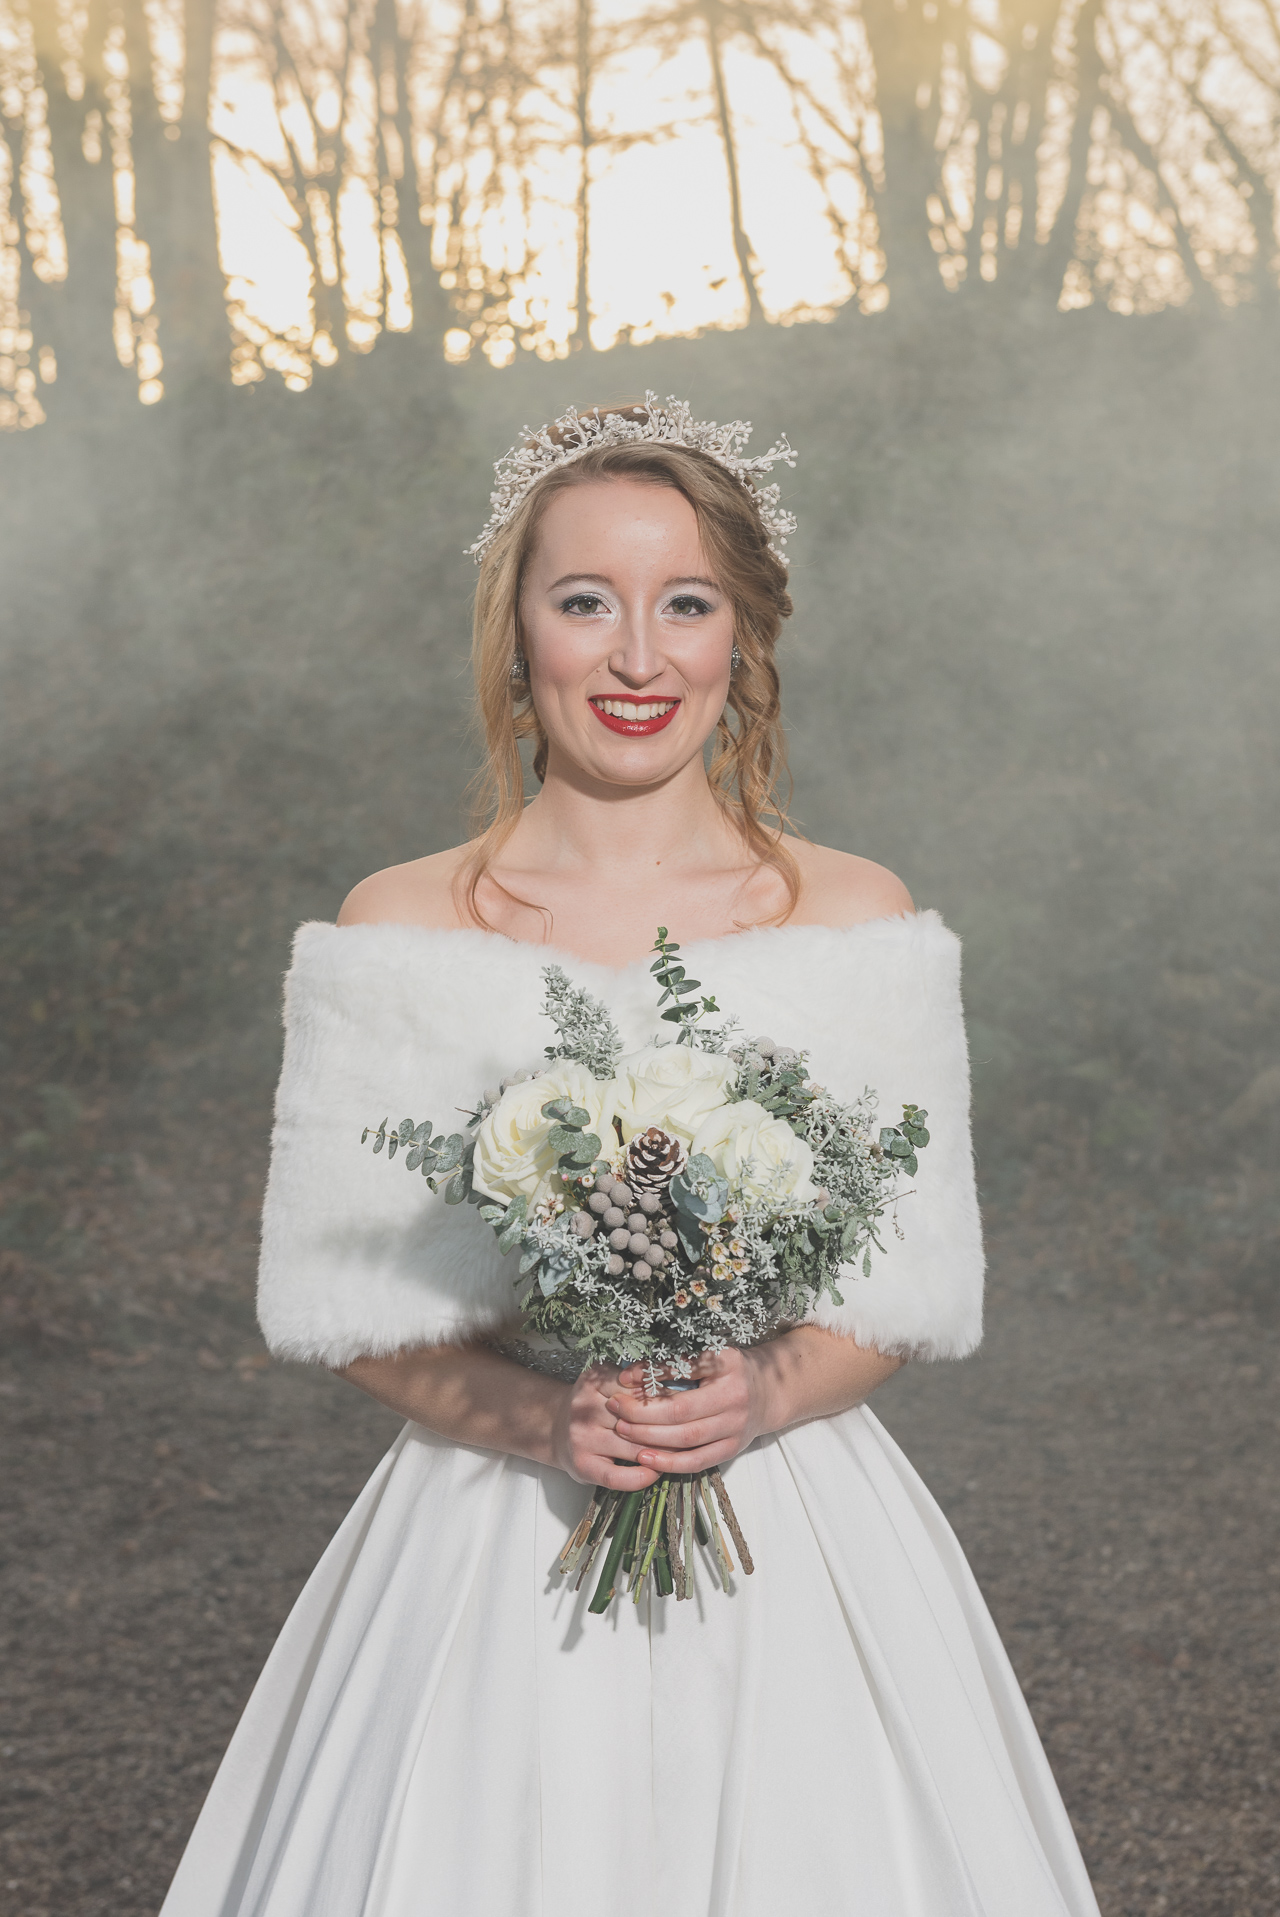 Swallows Oast Ticehurst Bridal Portrait Photo Shoot | Oakhouse Photography